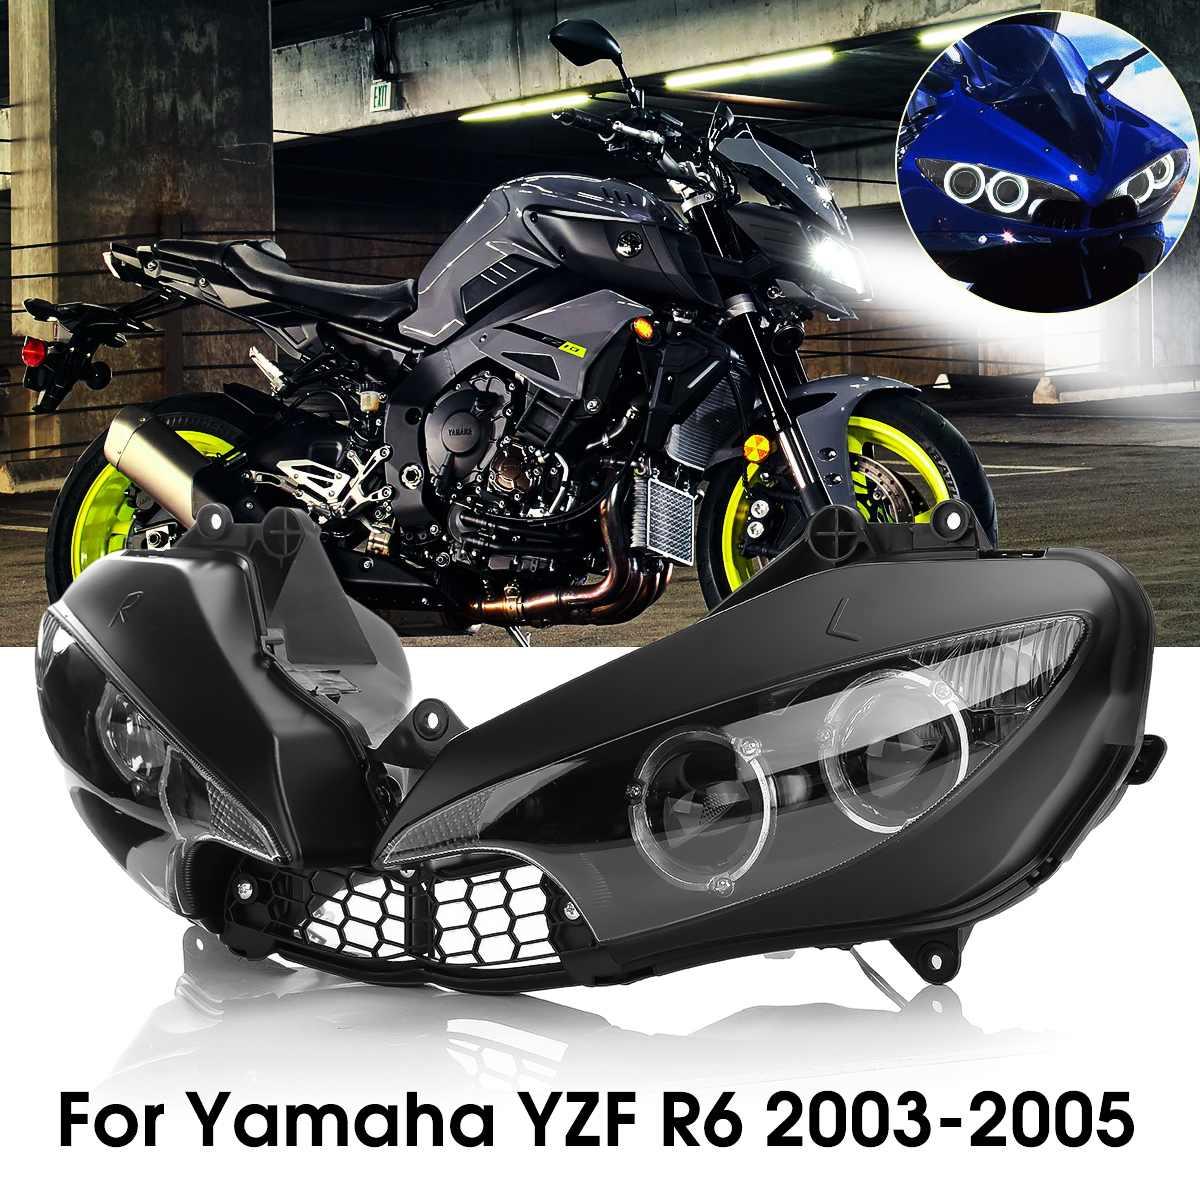 Для Yamaha YZFR6 YZF R6-2005 для Yzf-R6 2003 мотоцикл передняя фара голова свет лампы фары Clear 2003 2005 2004 стиль